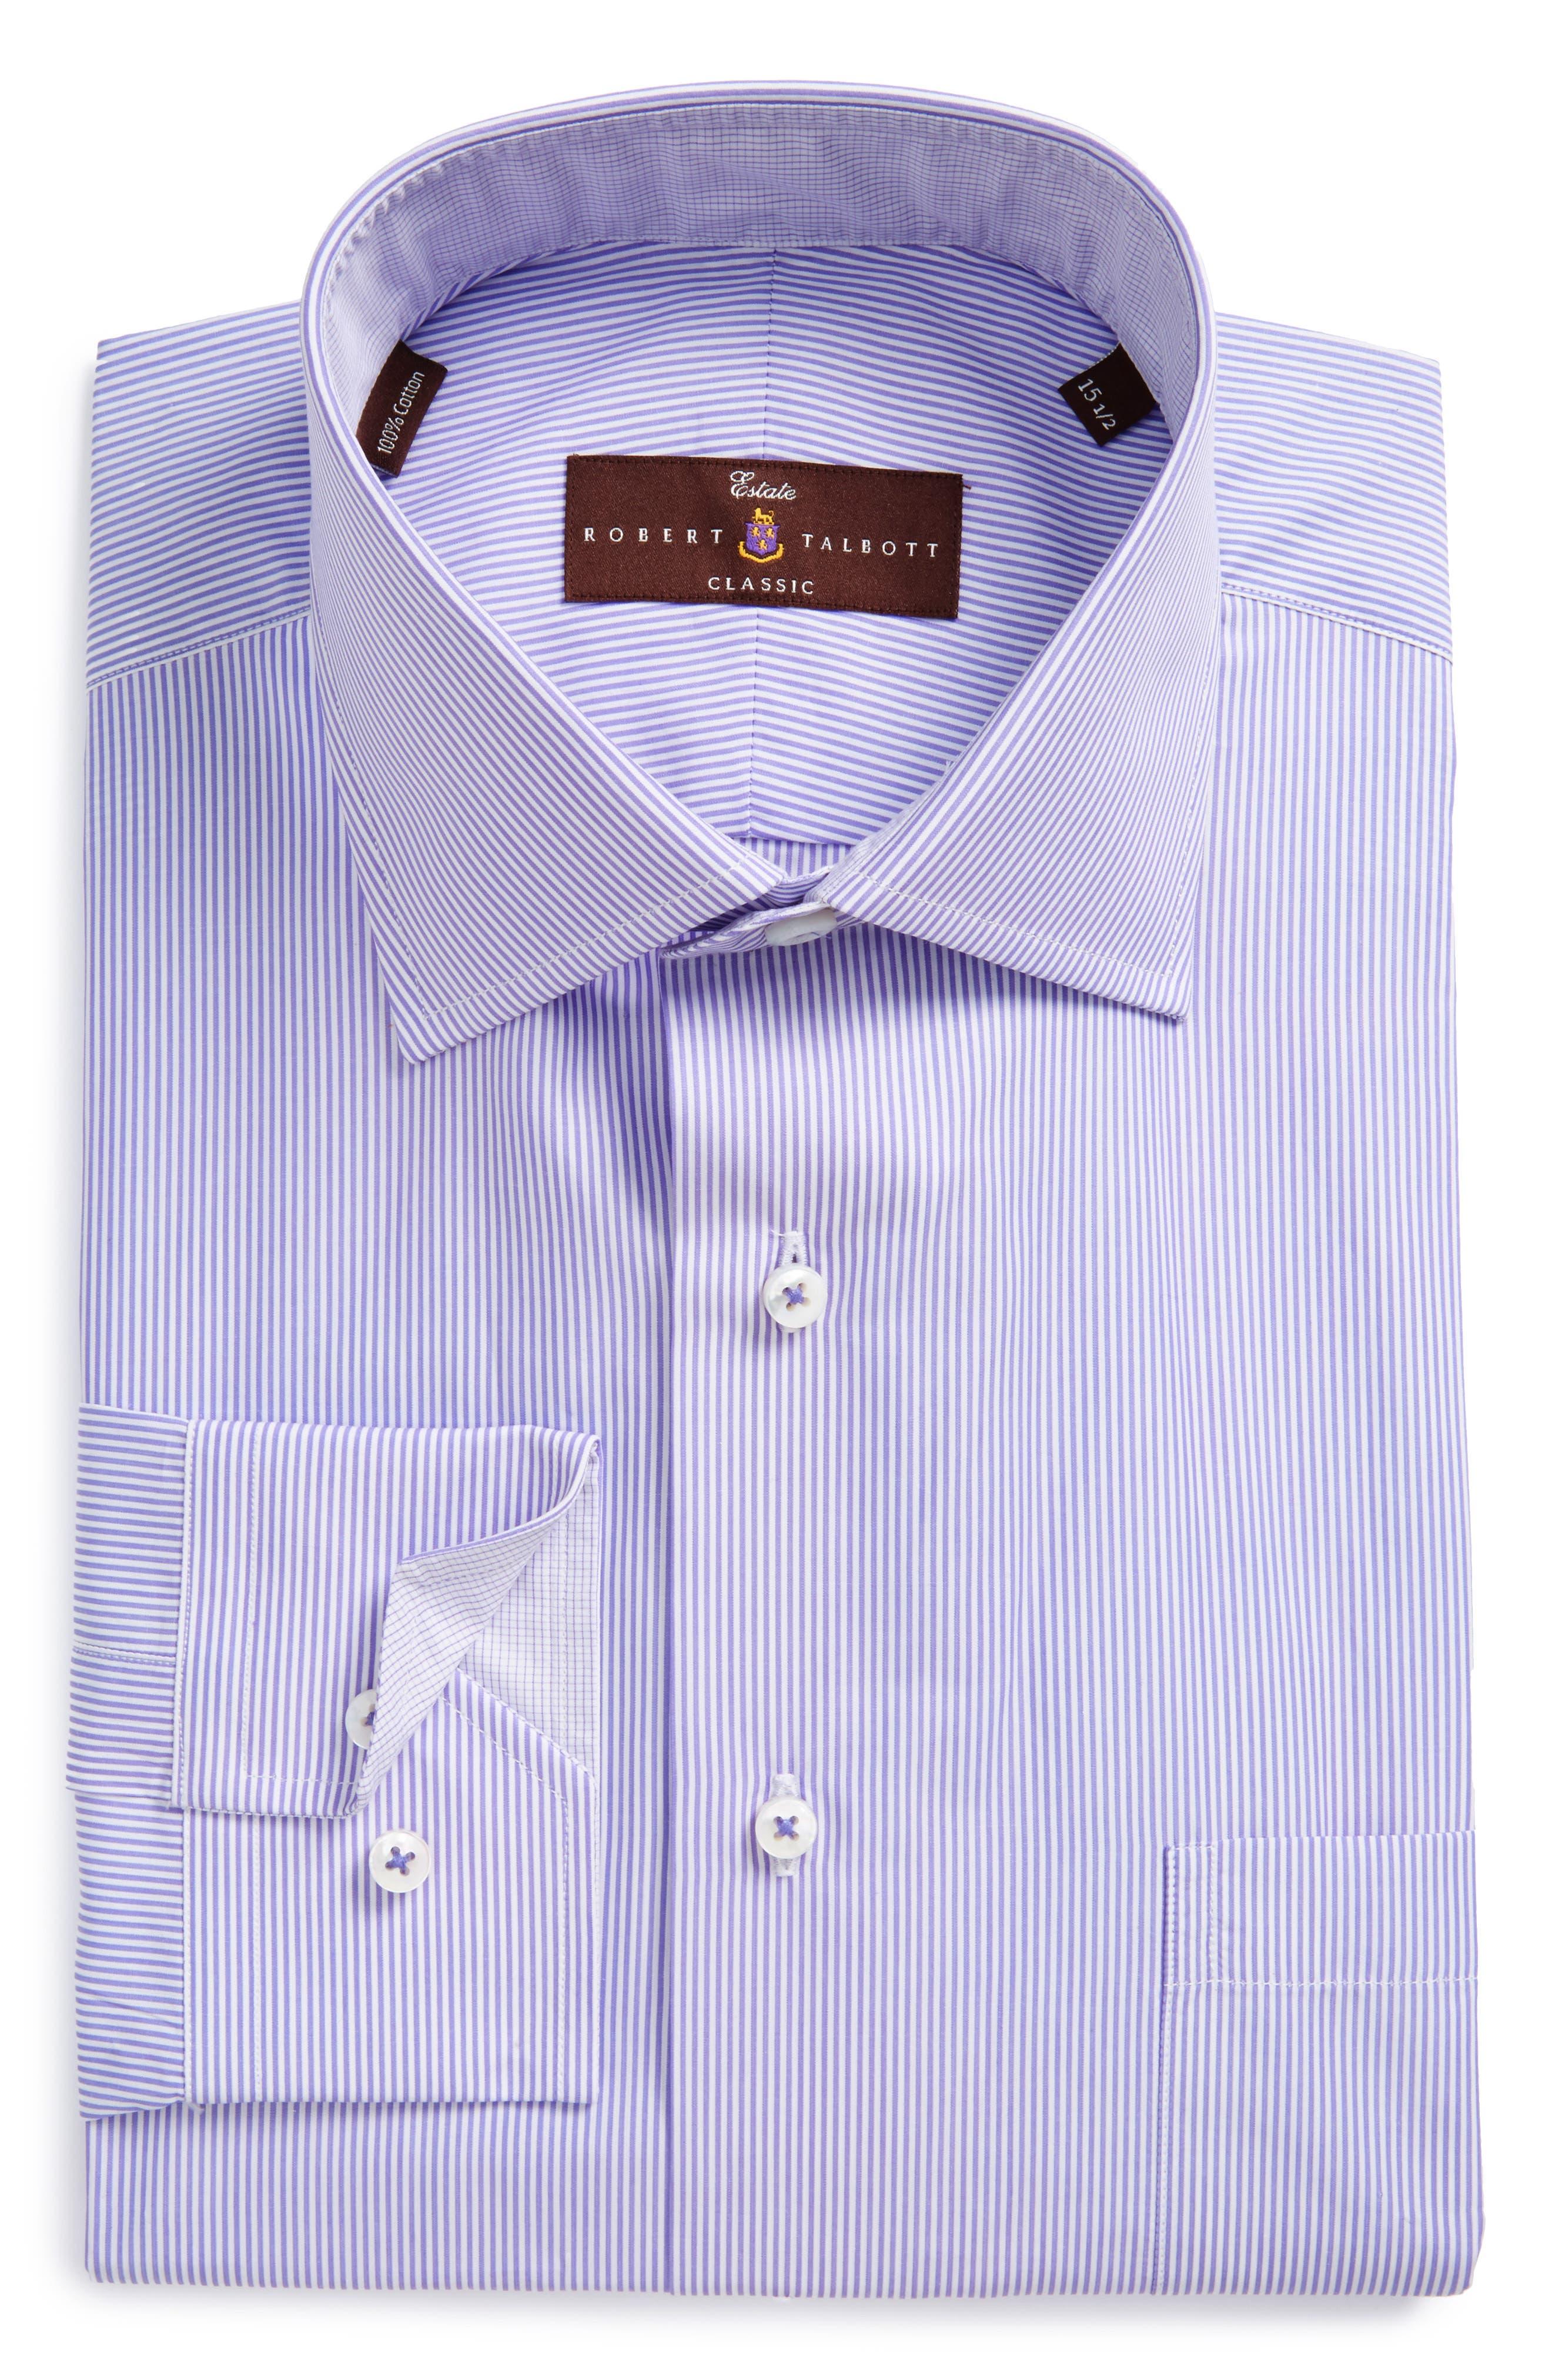 ROBERT TALBOTT Estate Classic Fit Stripe Dress Shirt